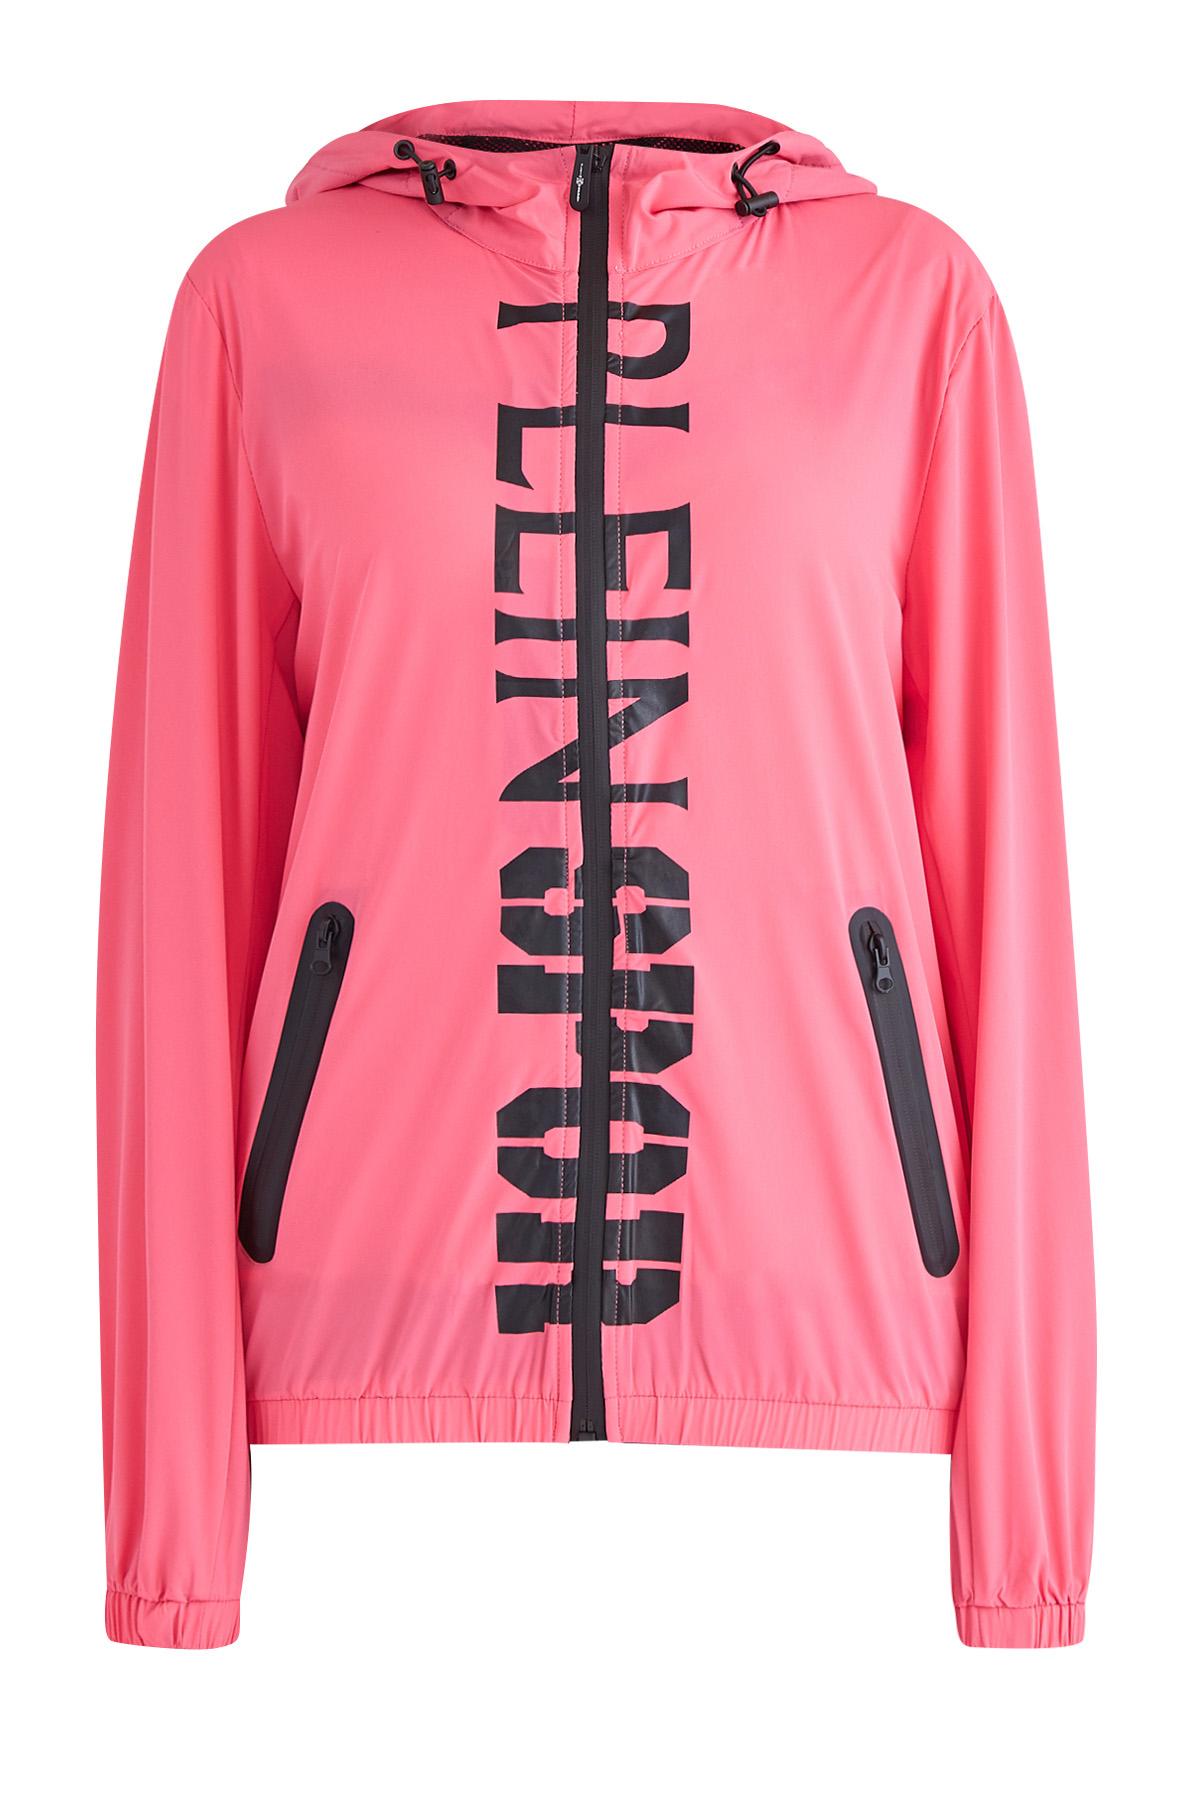 Купить Куртка, PHILIPP PLEIN, Италия, нейлон 85%, спандекс 15%